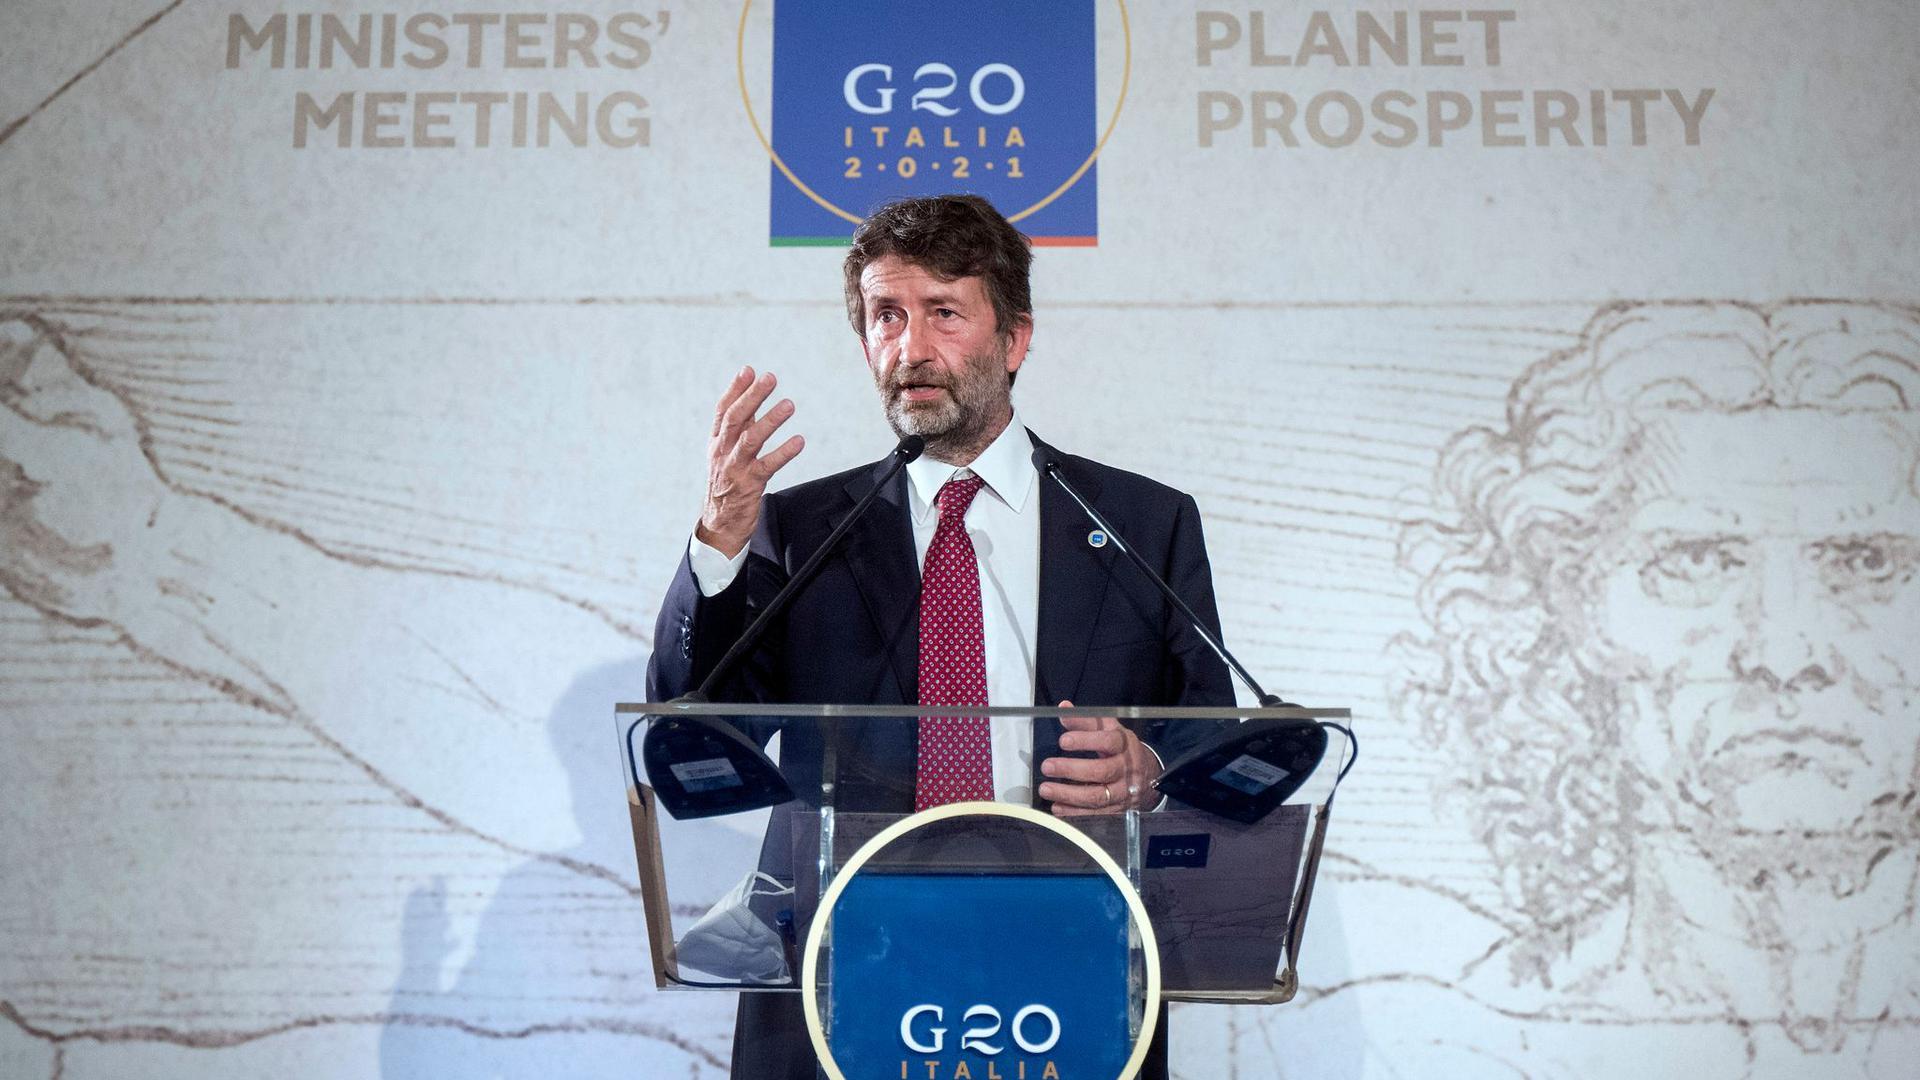 Italiens Kulturminister Dario Franceschini spricht während der Pressekonferenz zum Abschluss des G20-Kulturministertreffens.